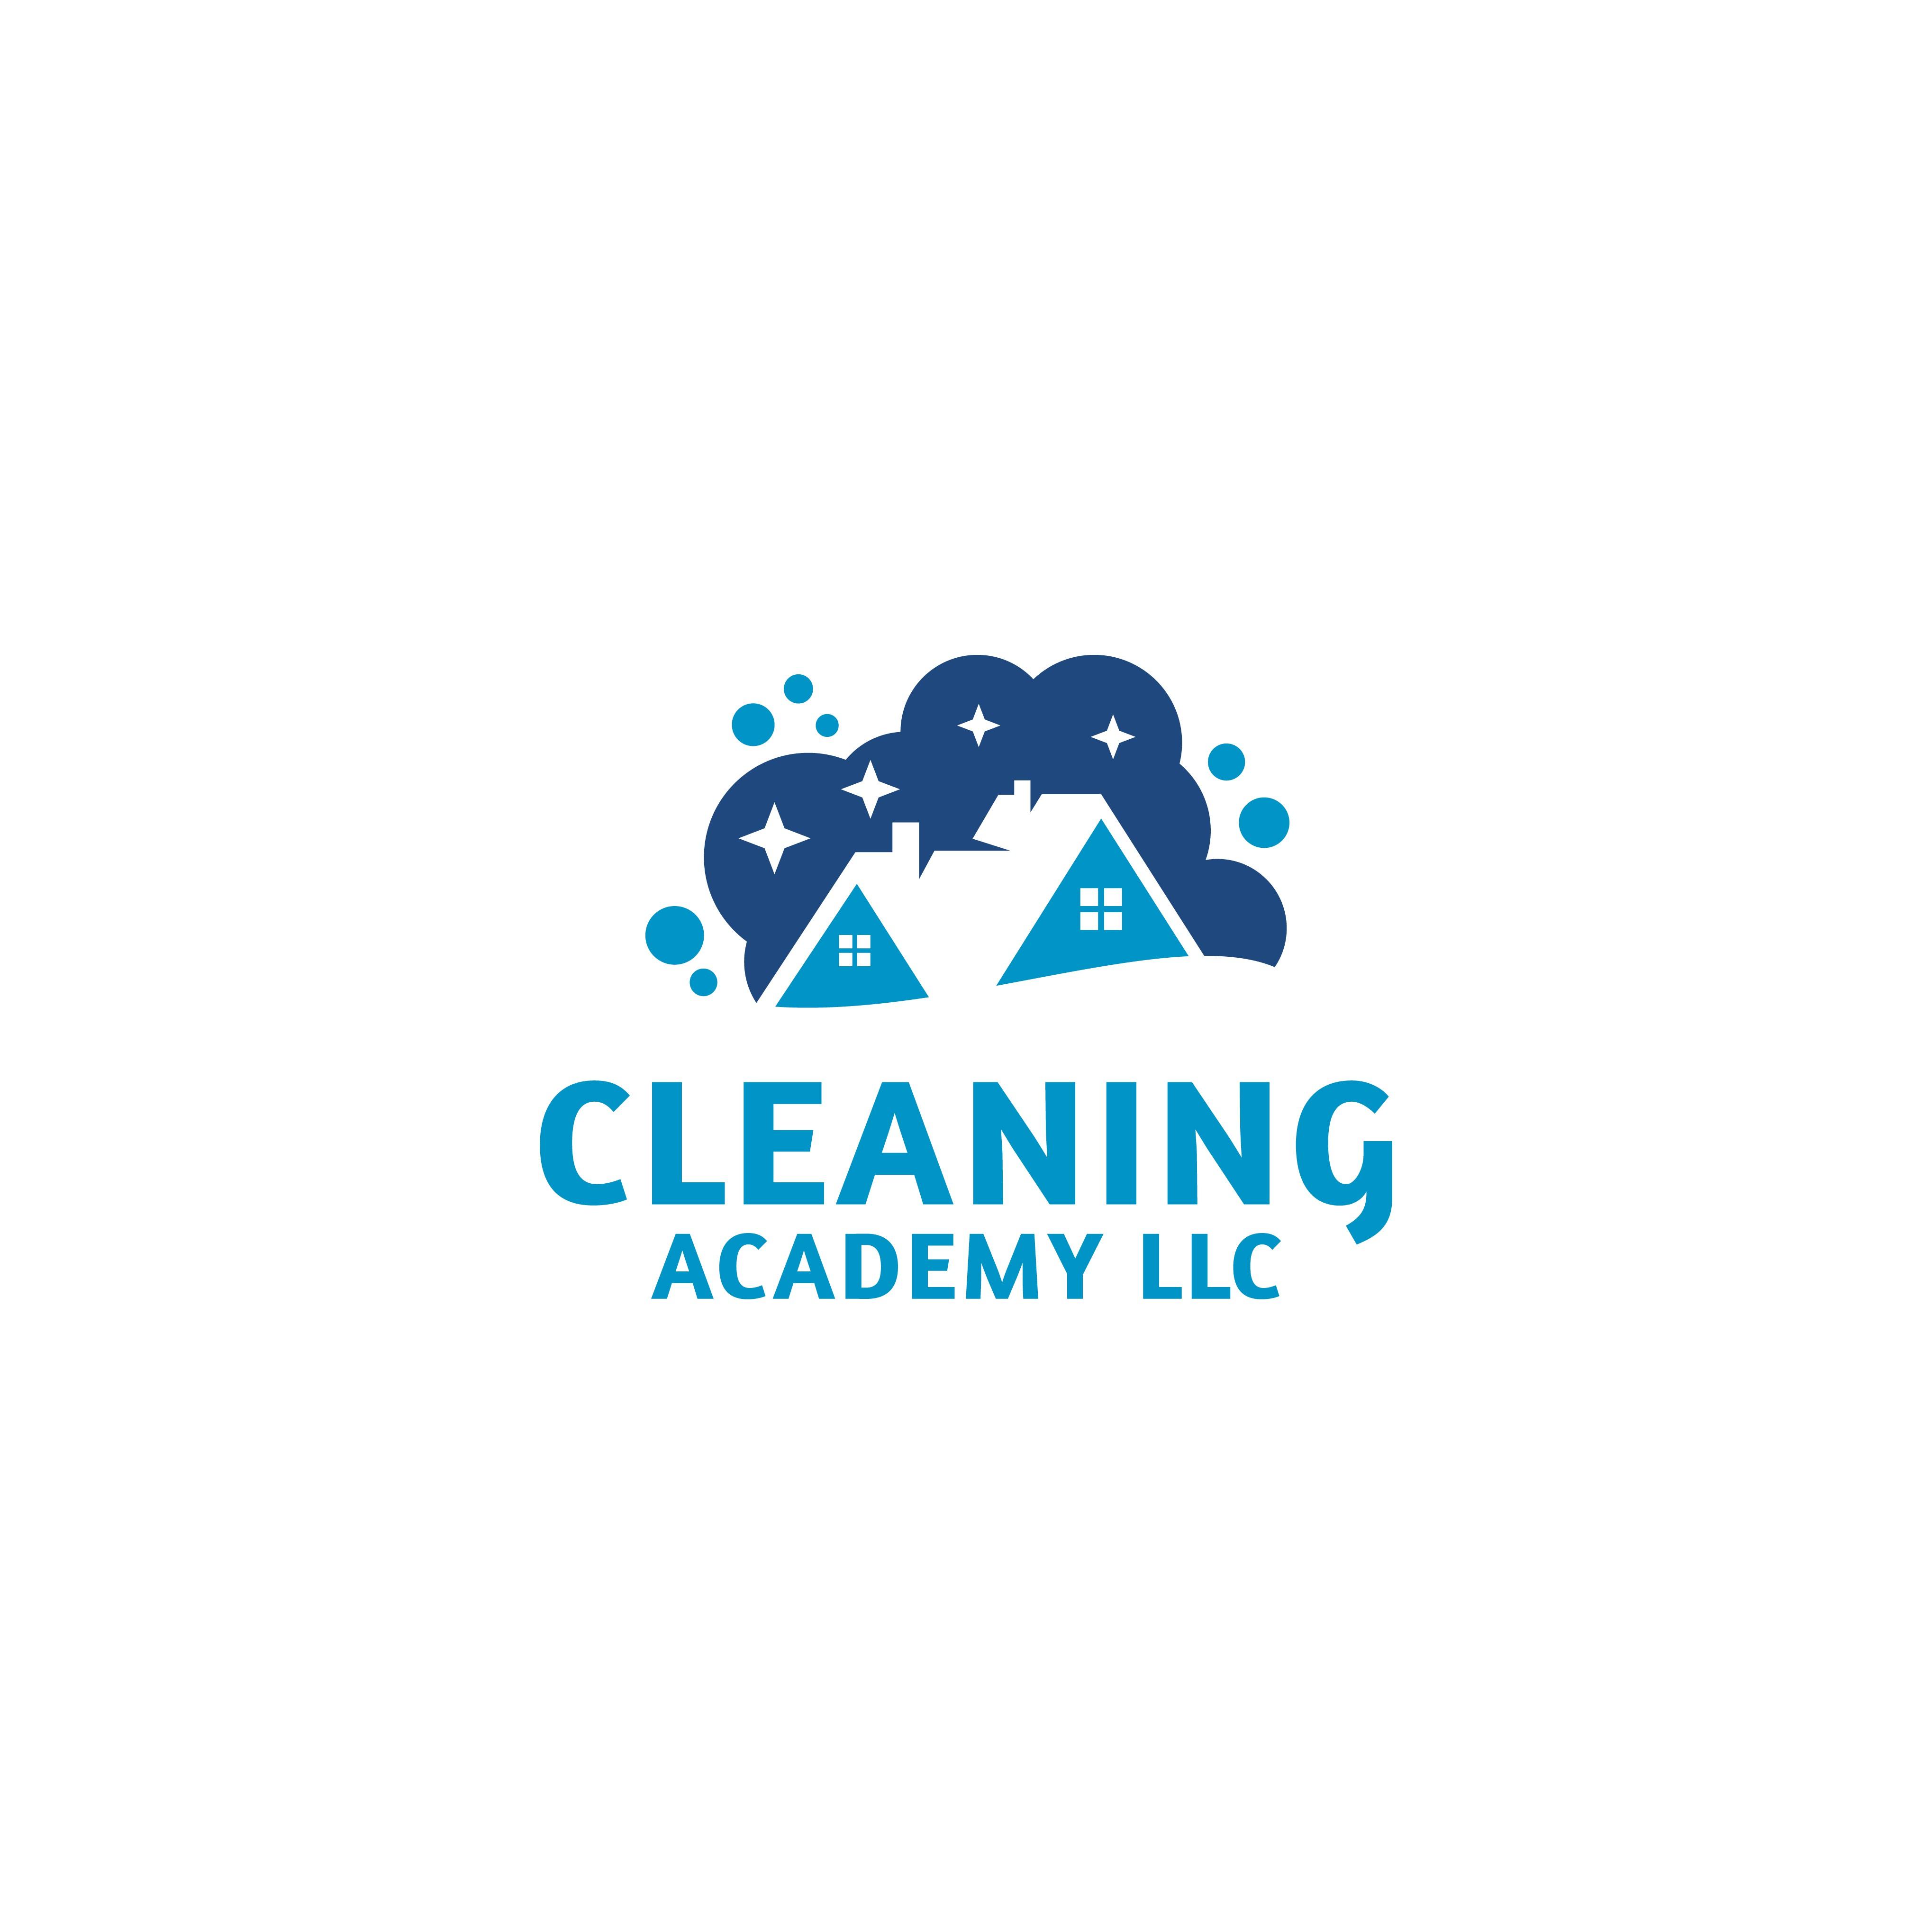 Cleaning Academy LLC